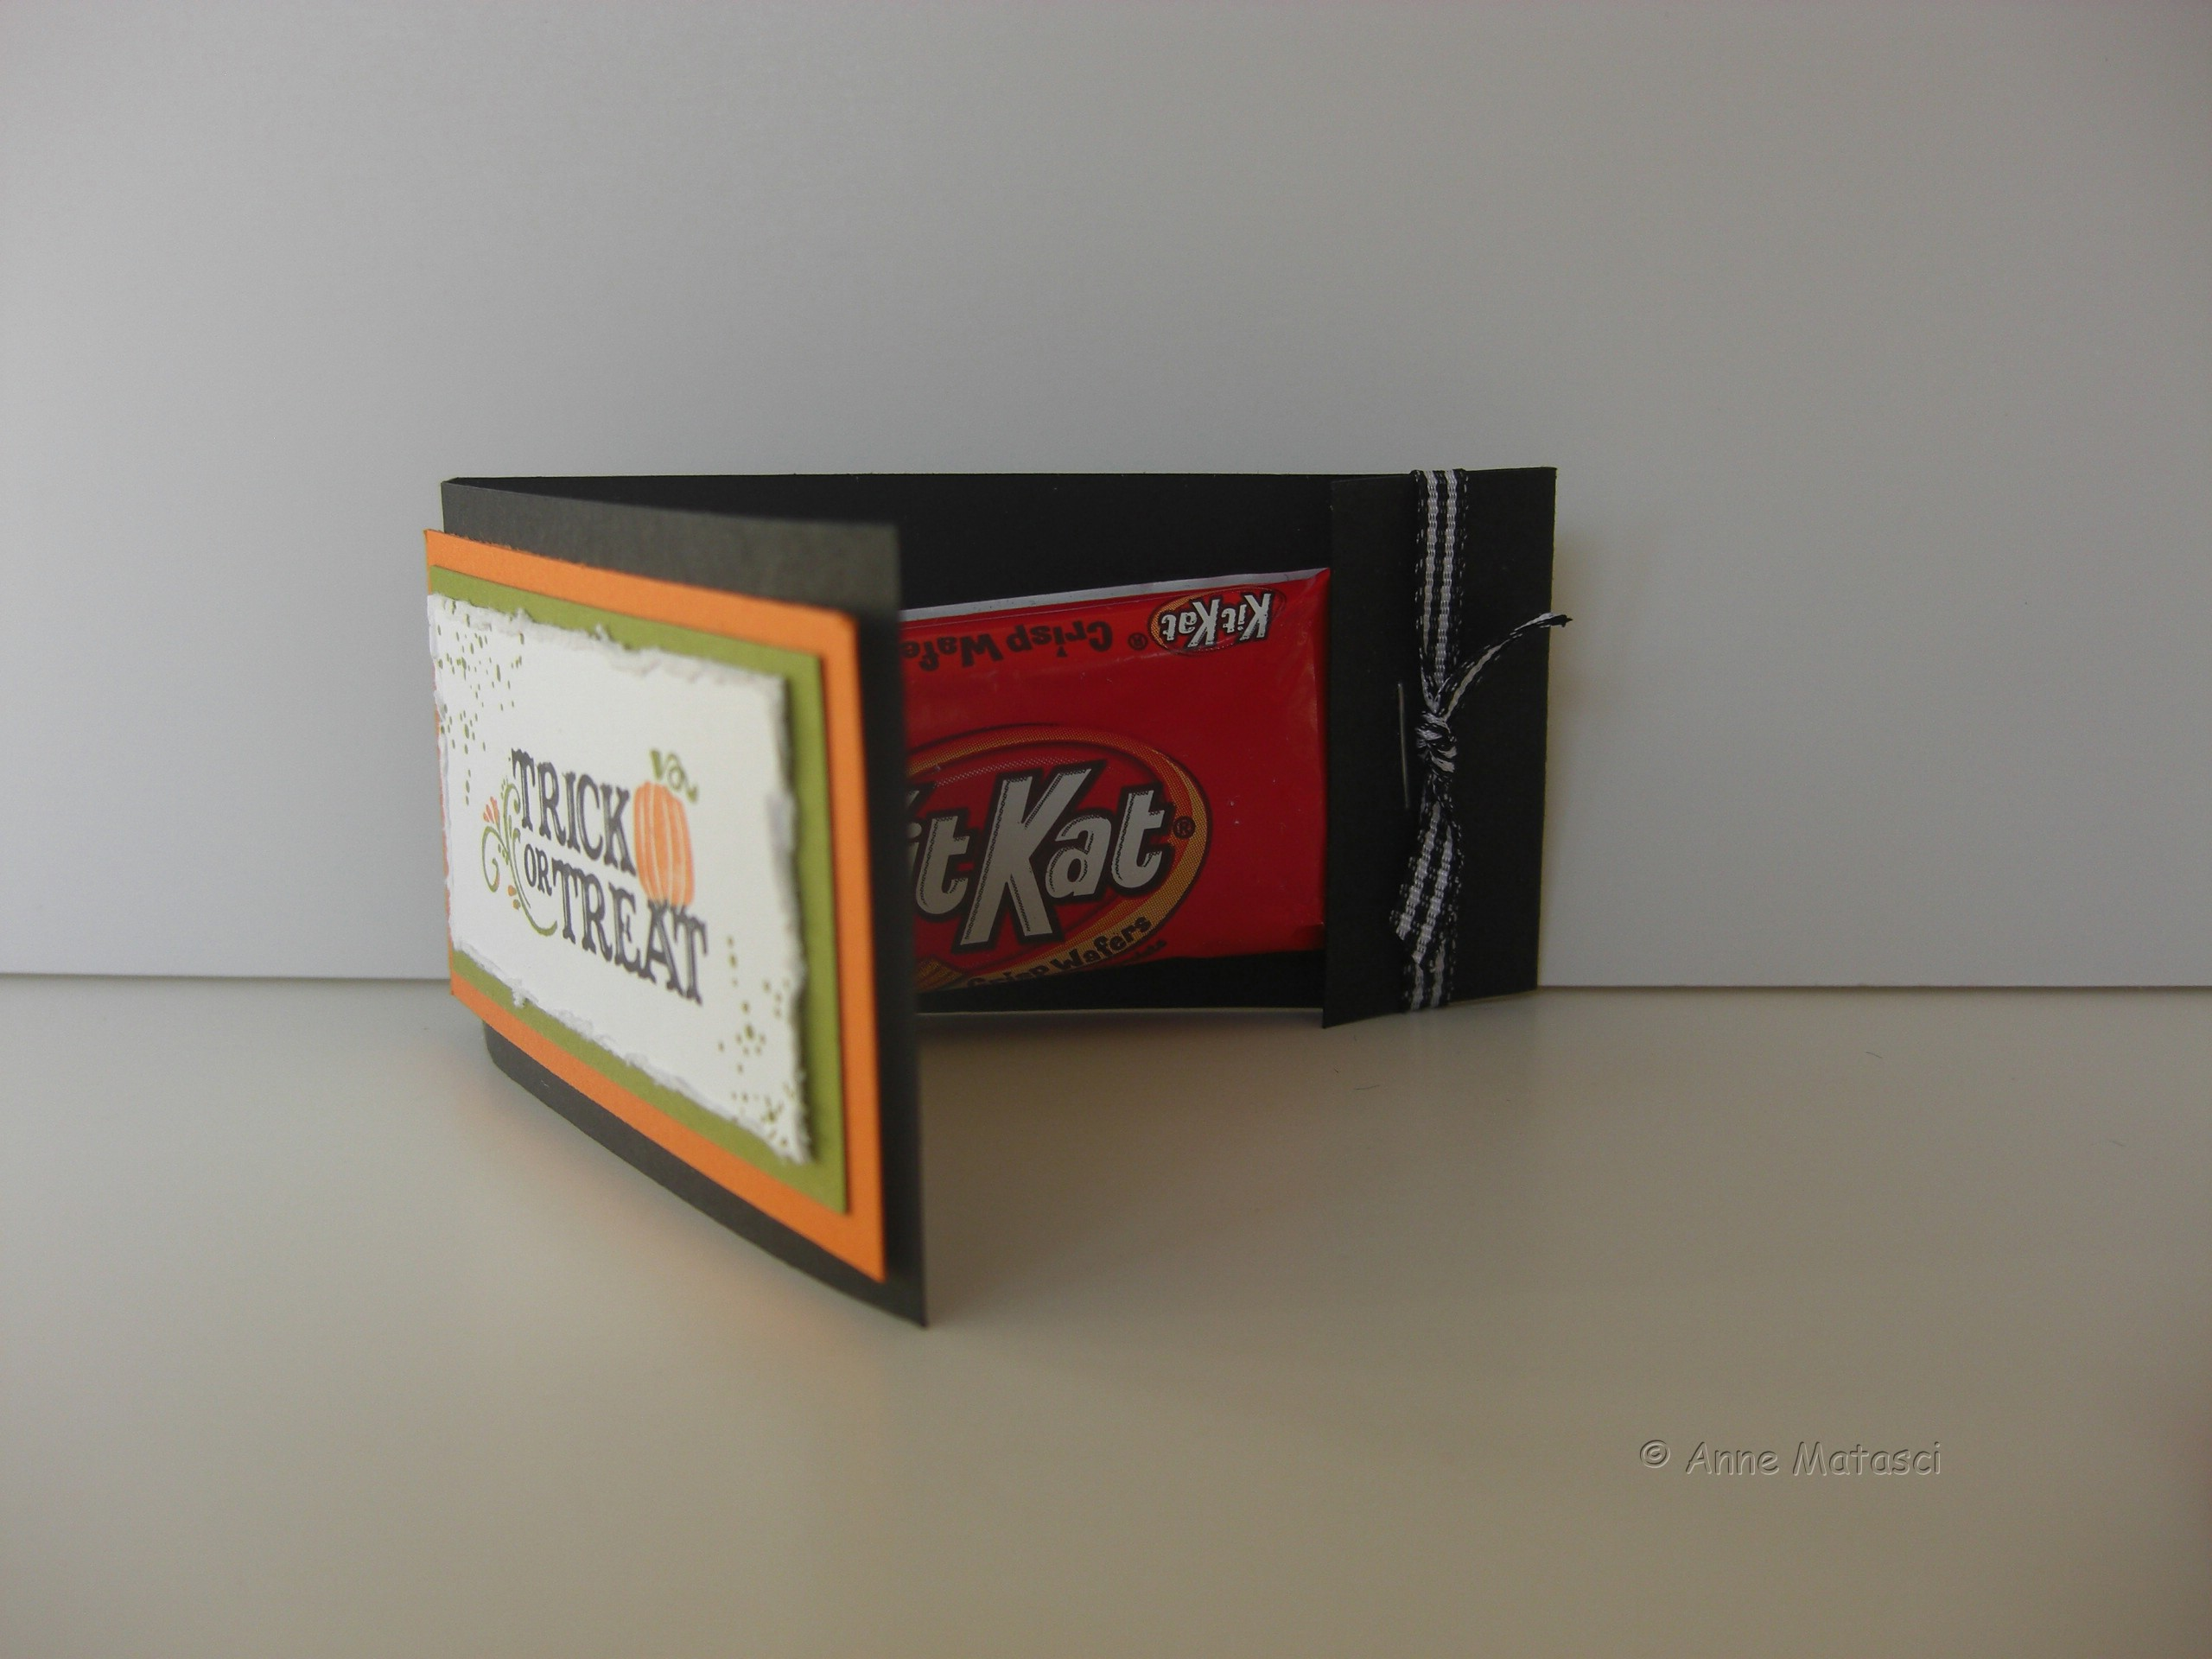 Break me off a piece of that Kit Kat Bar!